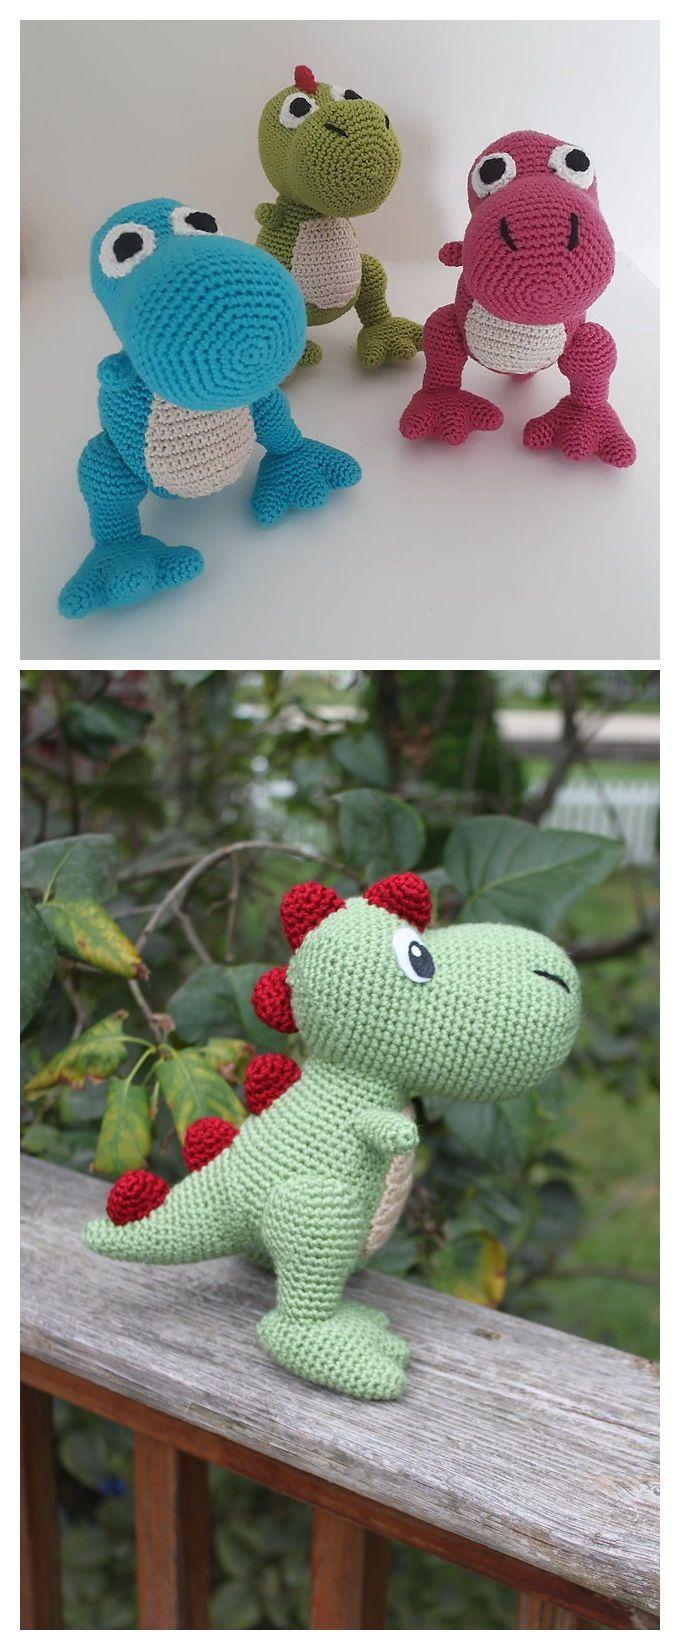 T-Rex Amigurumi Free Crochet Pattern - Knitting Projects ...